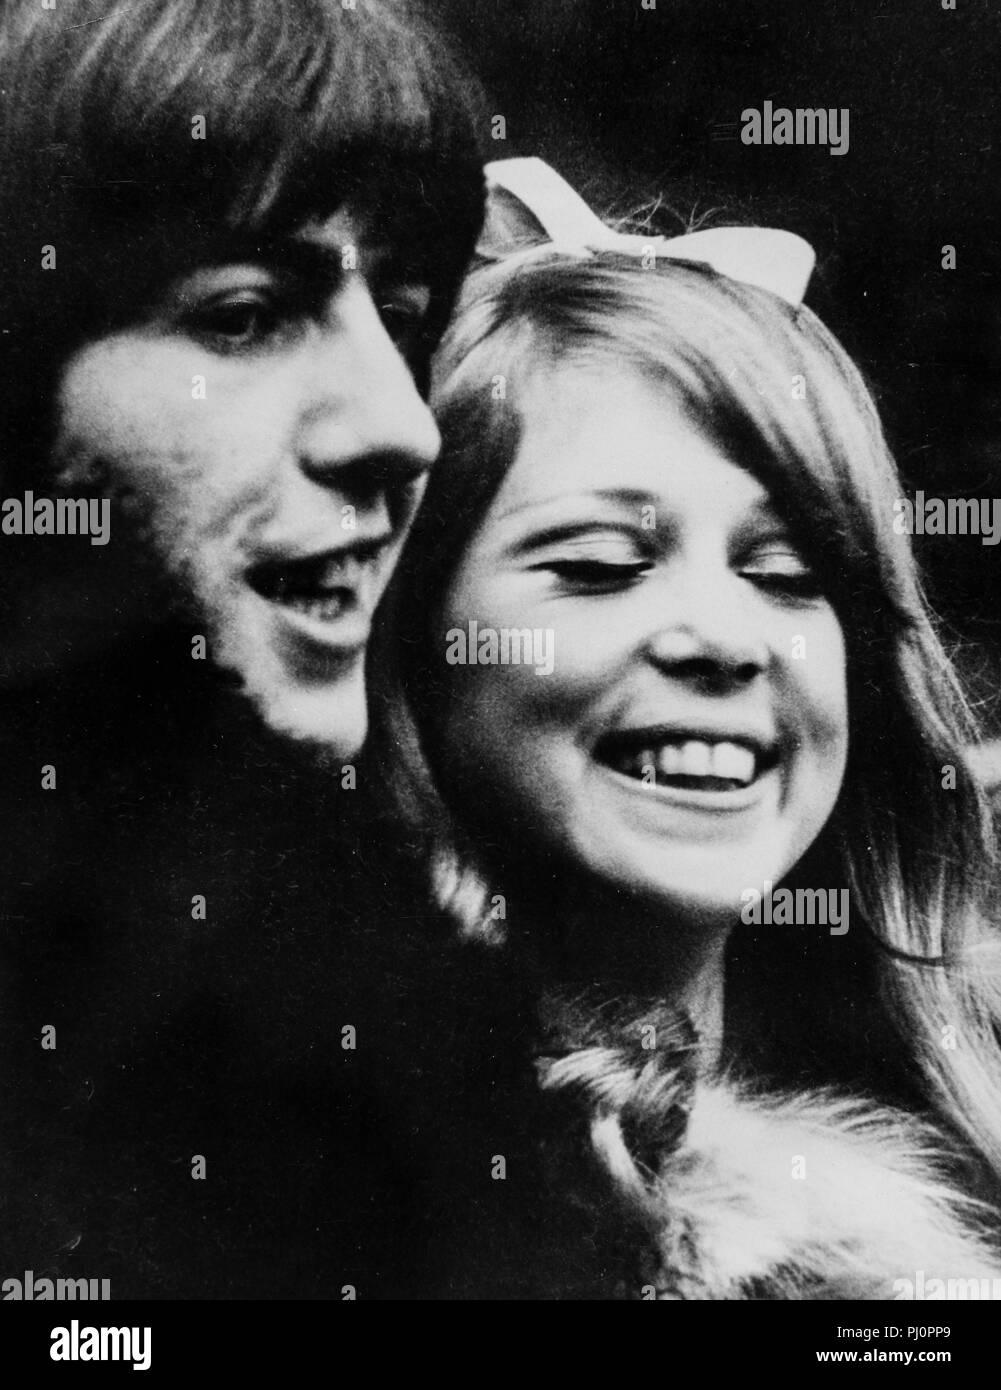 george harrison, pattie boyd, wedding, 1966 - Stock Image